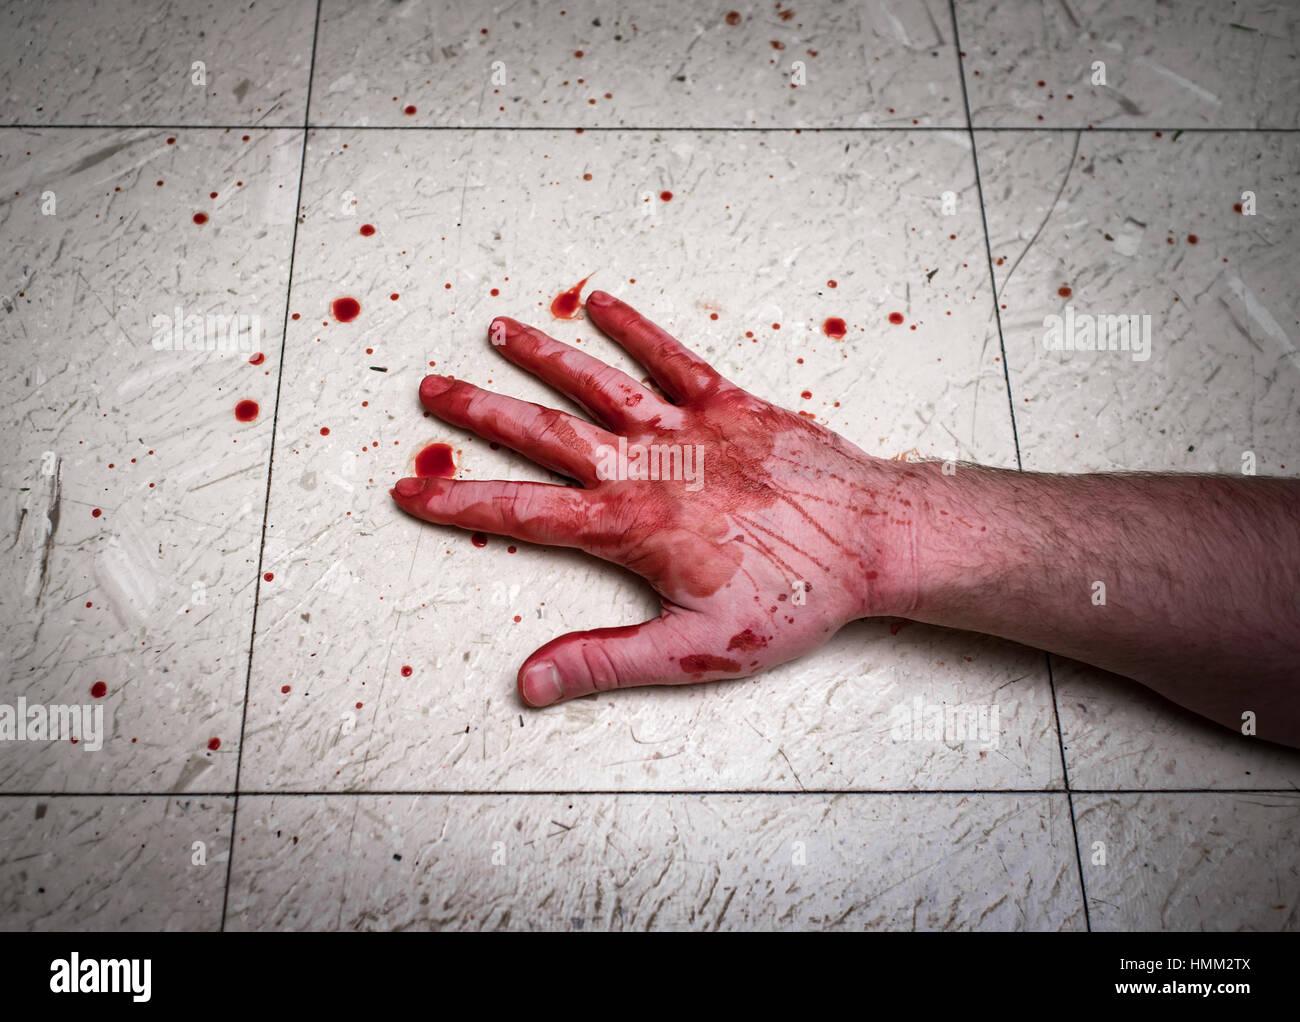 Blood Splatter On Floor